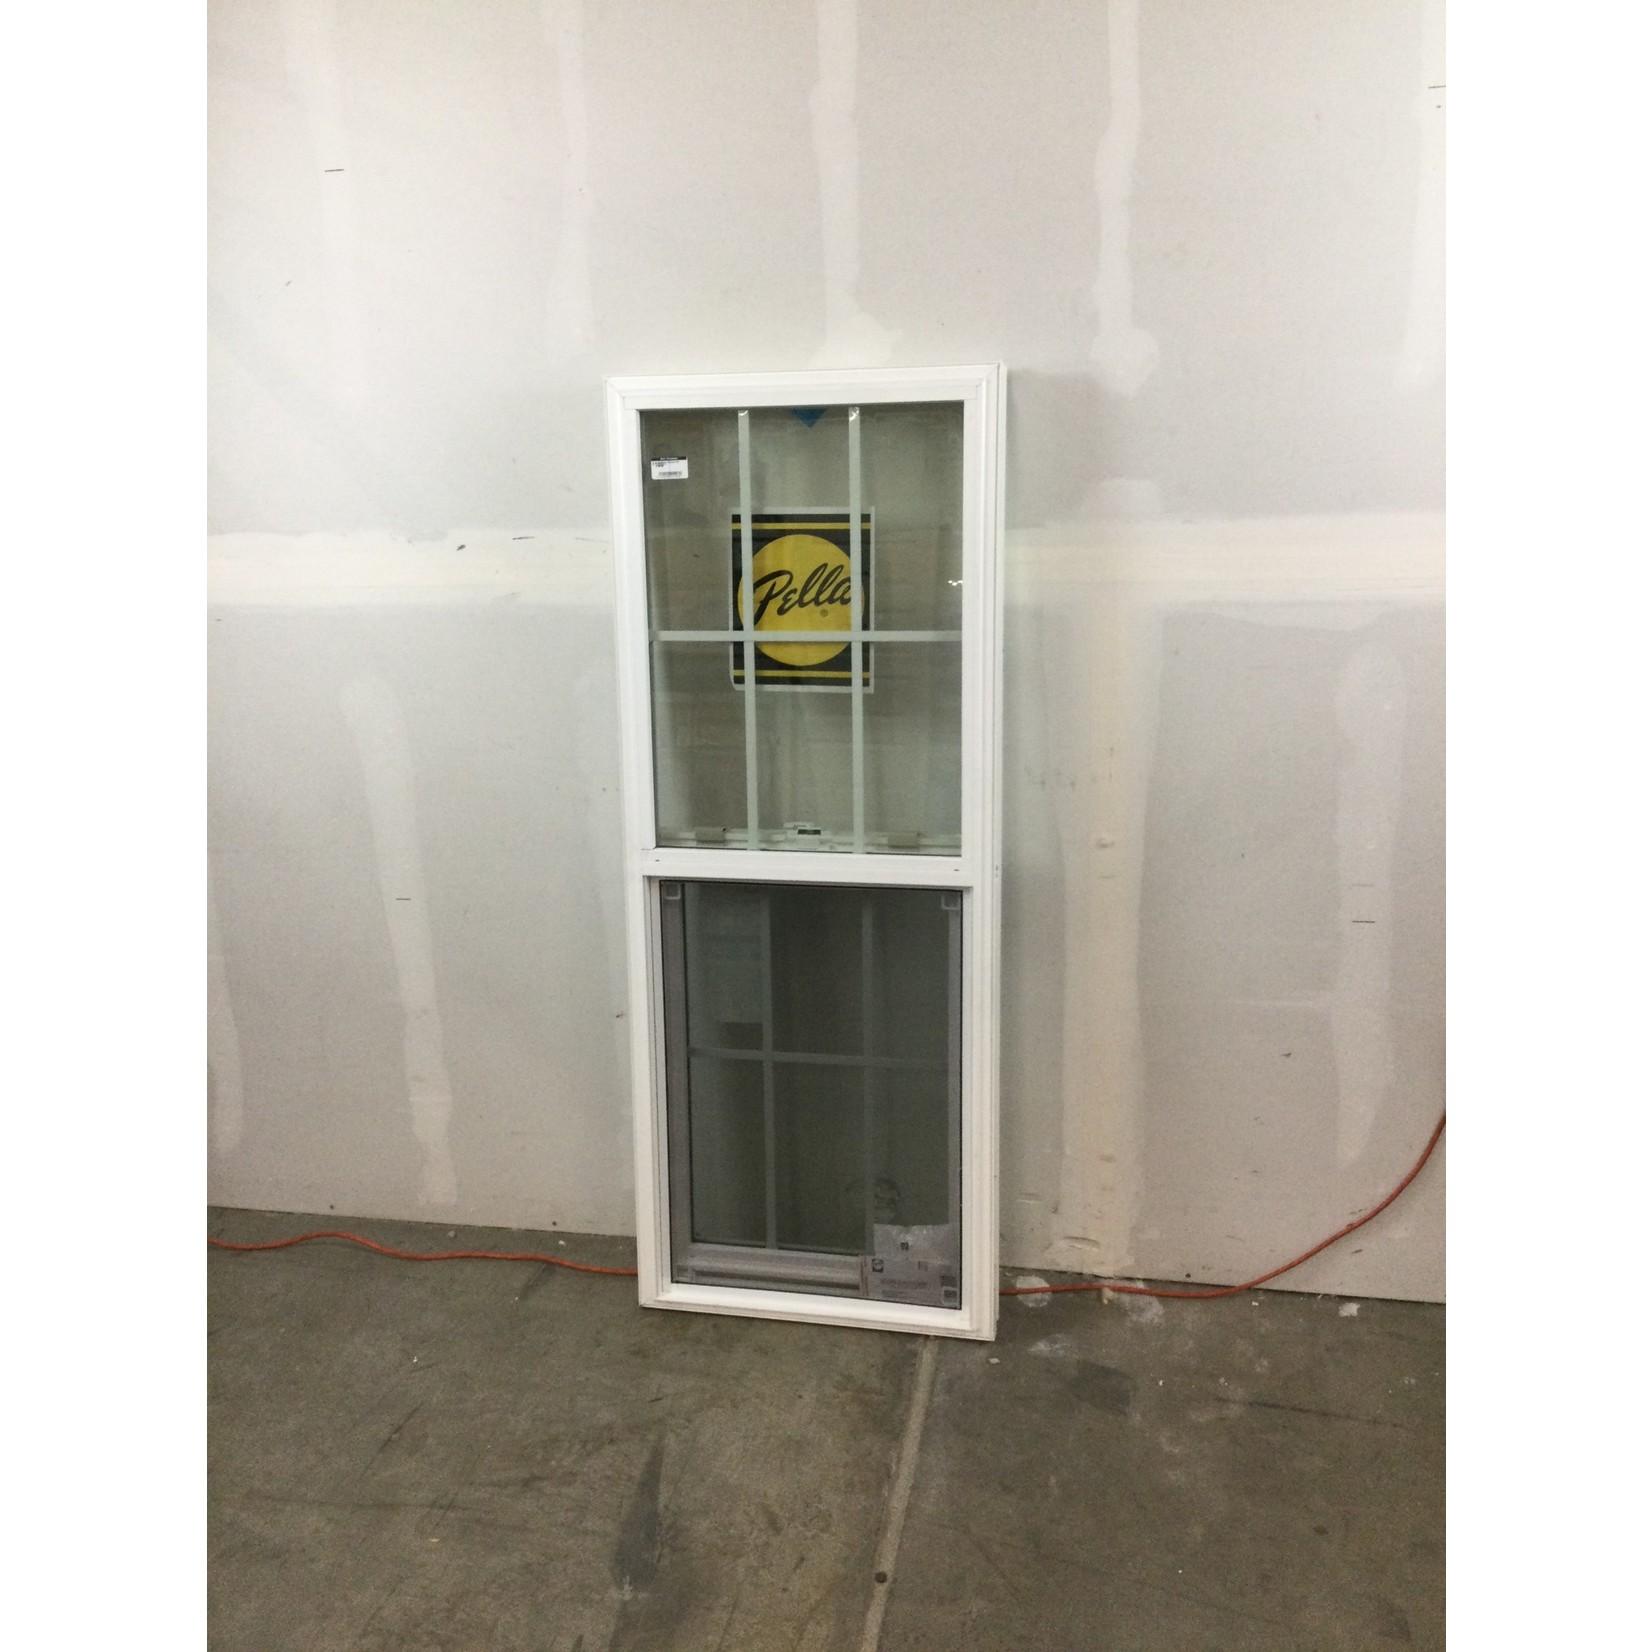 10484 Pella Vertical Slide Window